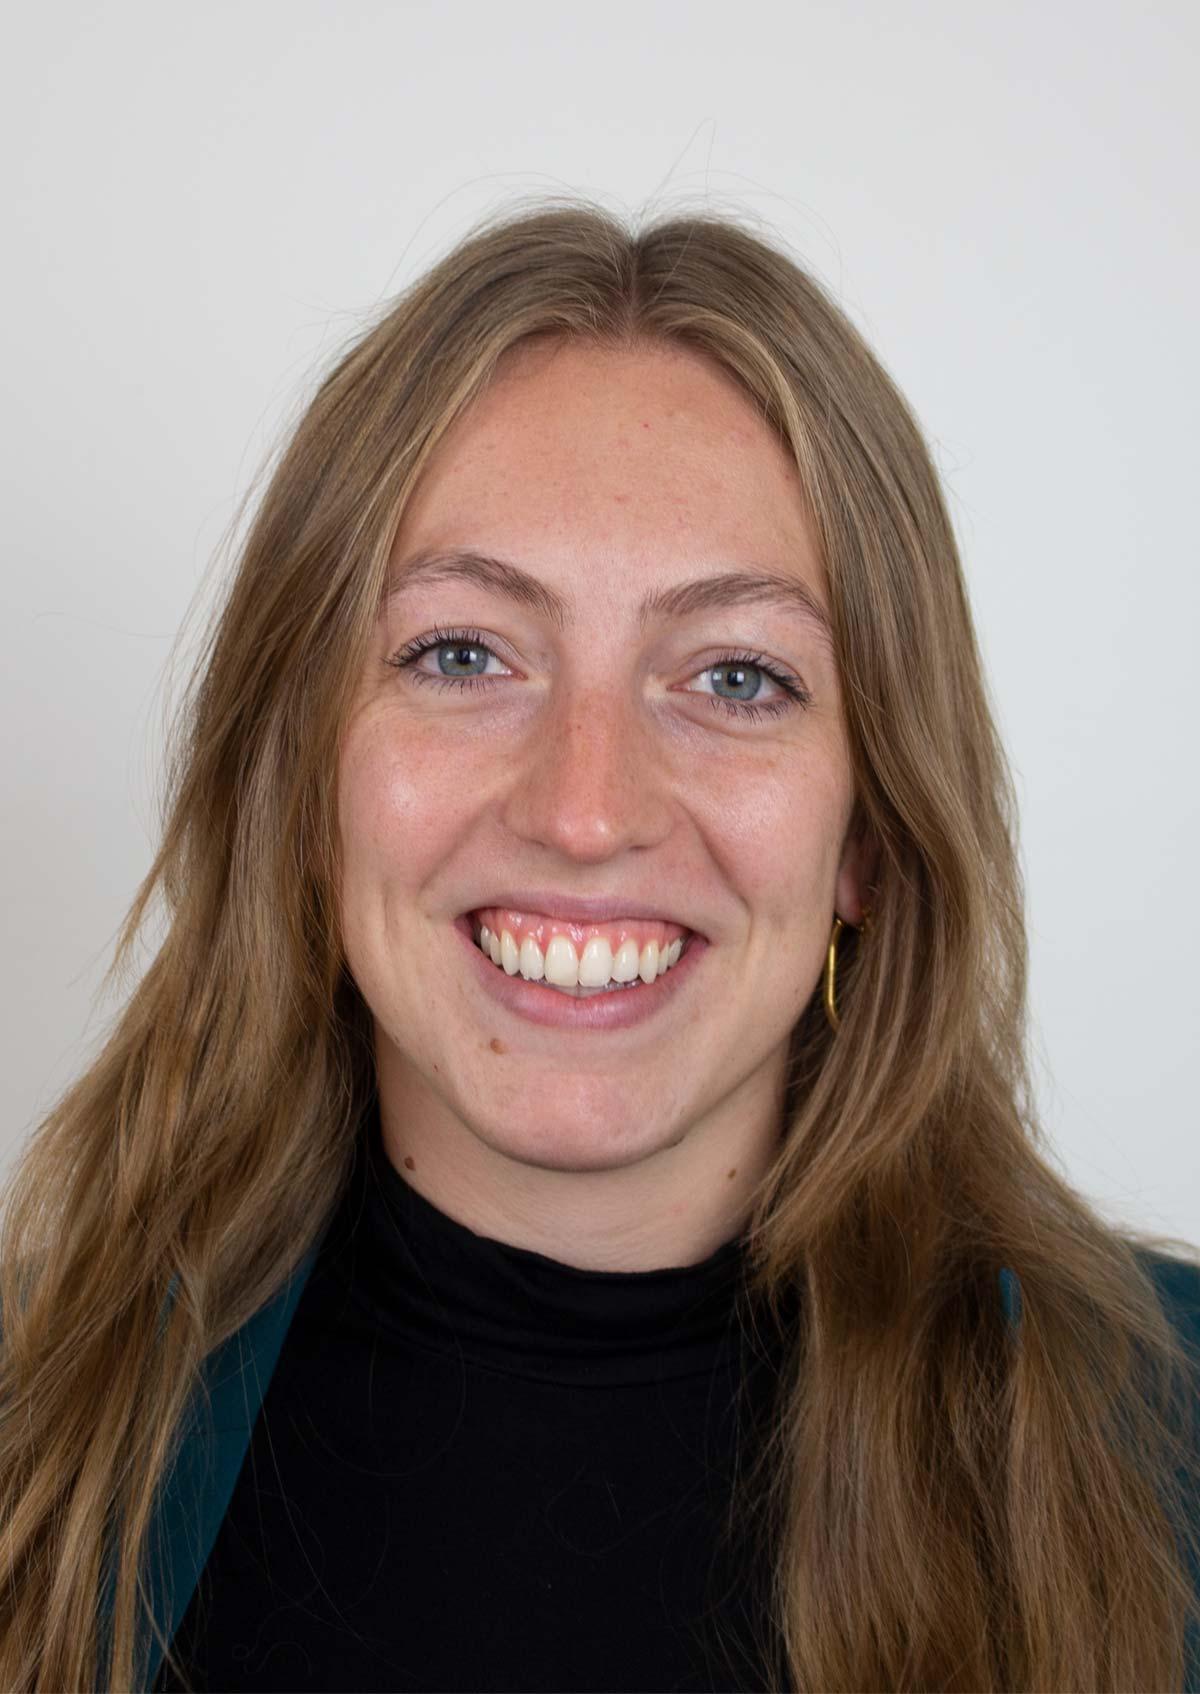 Laura Toethuis